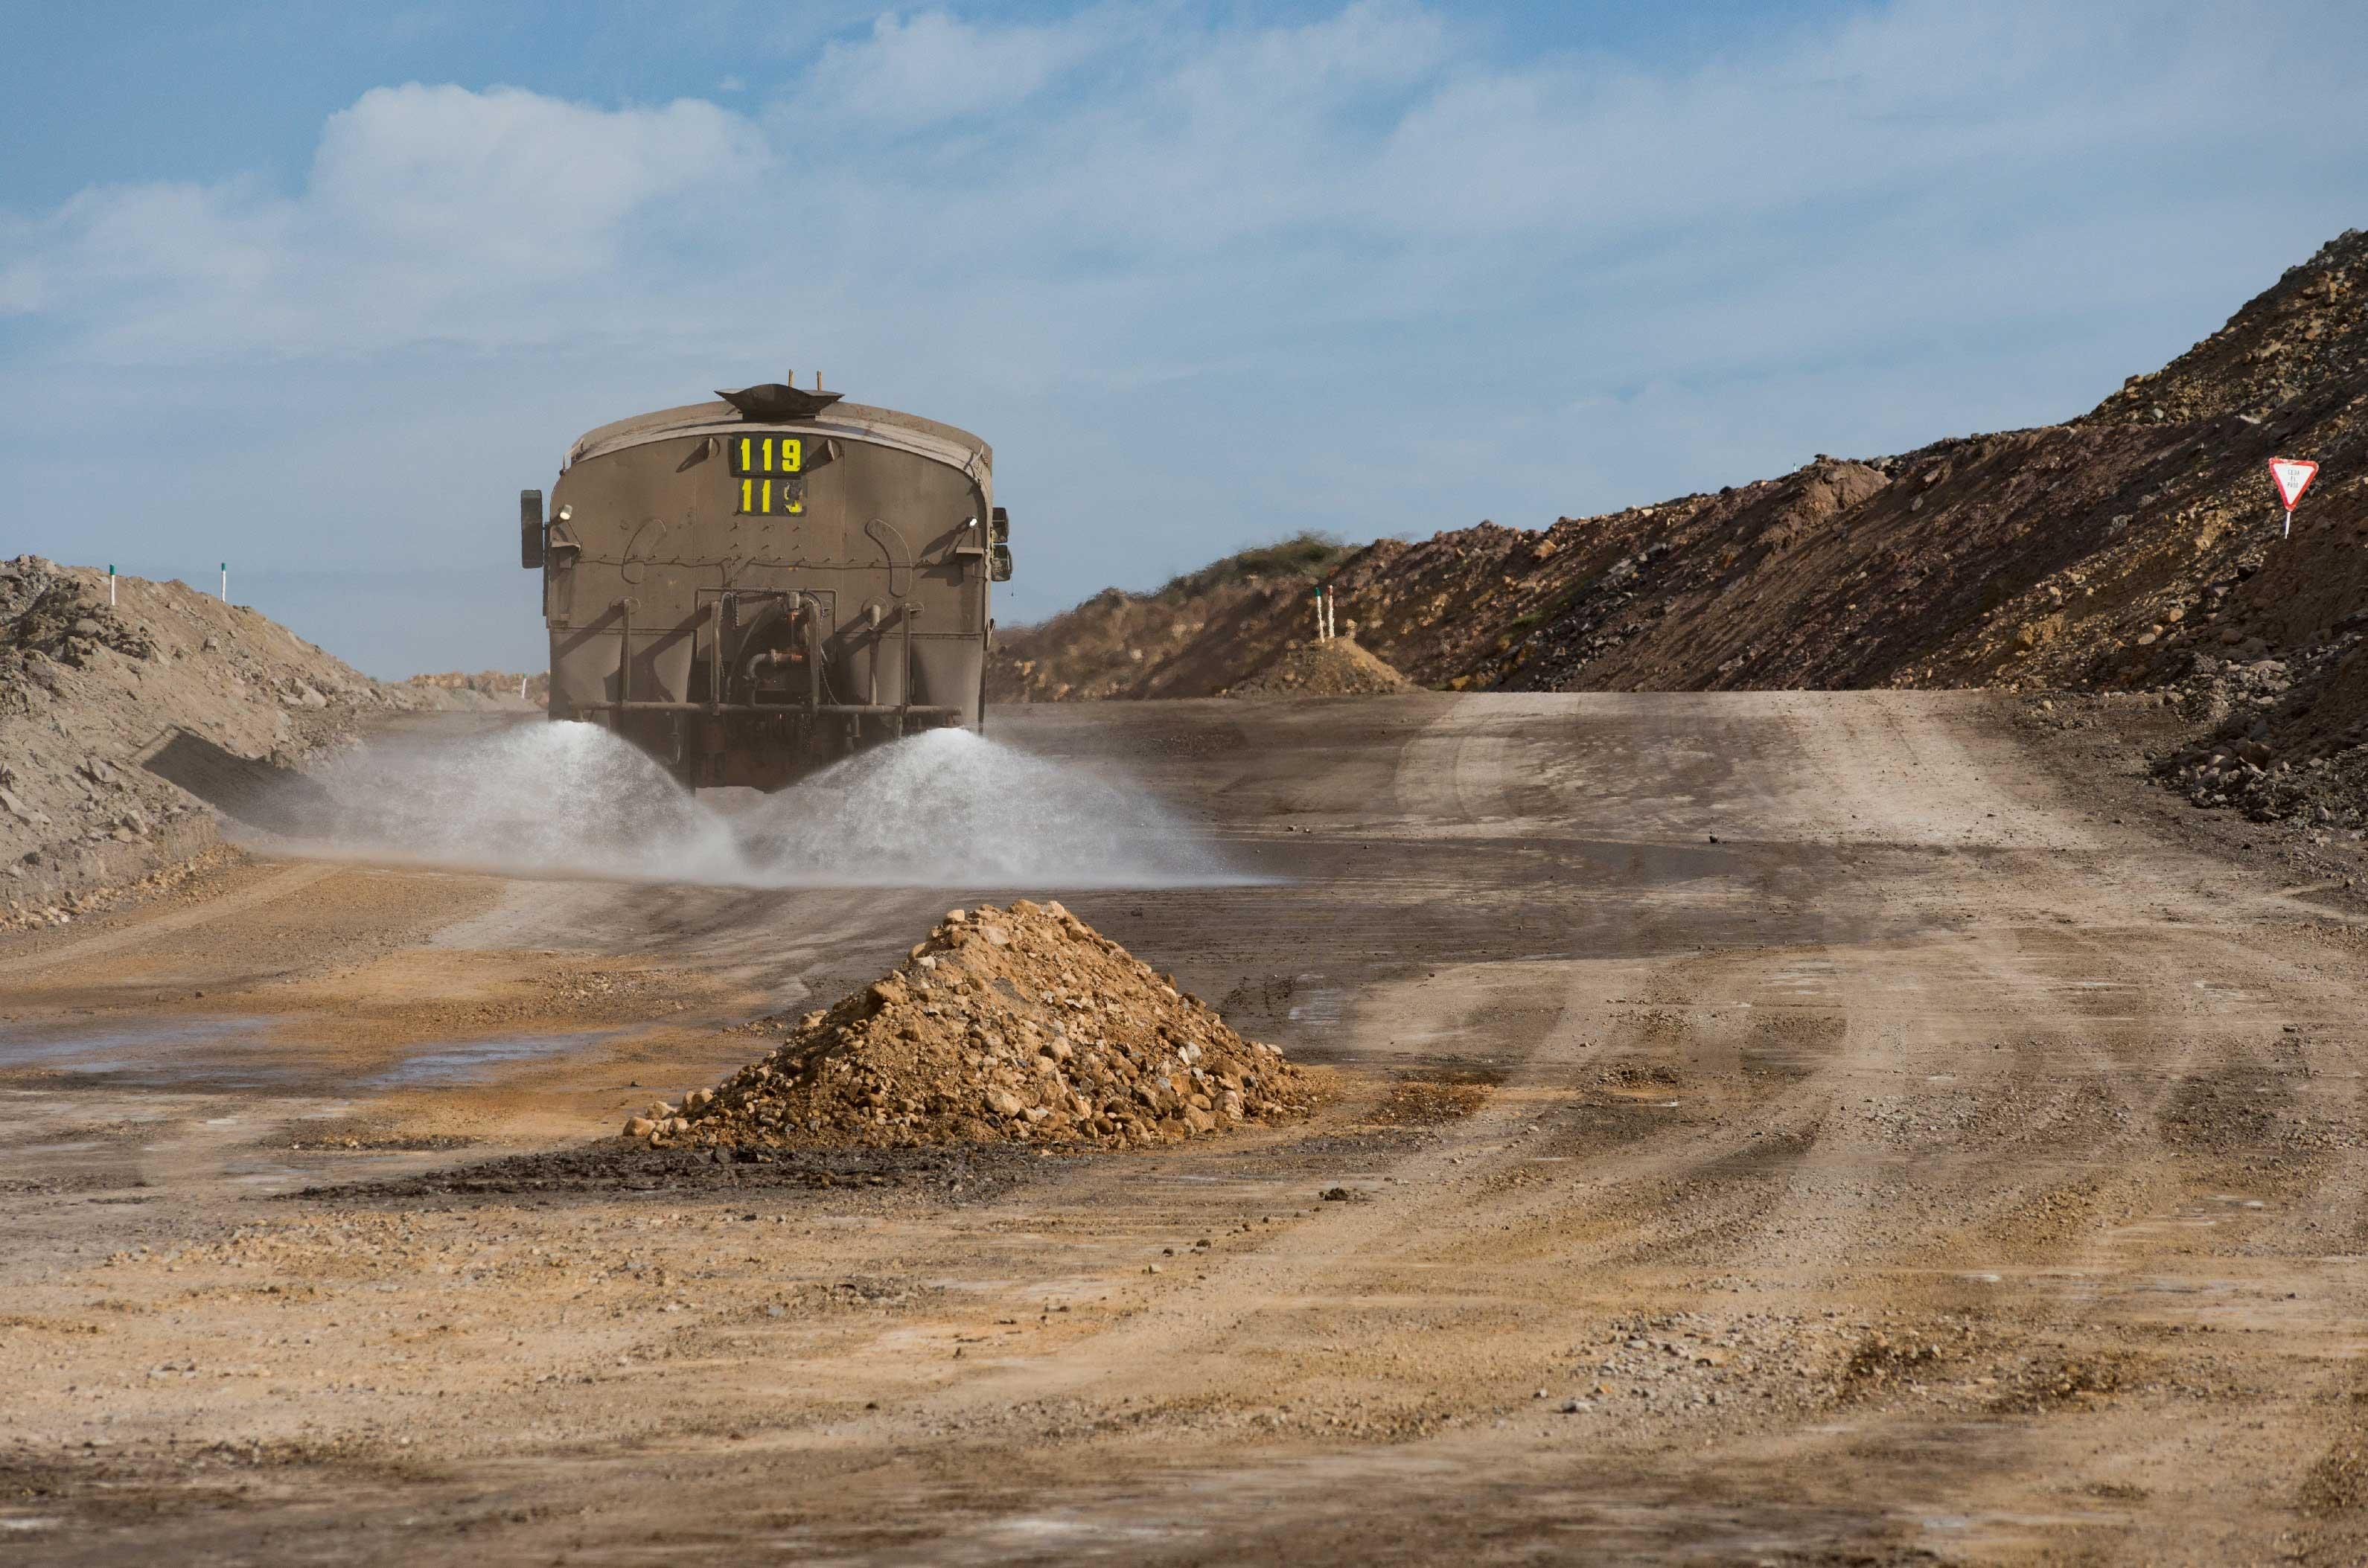 FTSE 100 cheap shares: Glencore sees production improving.